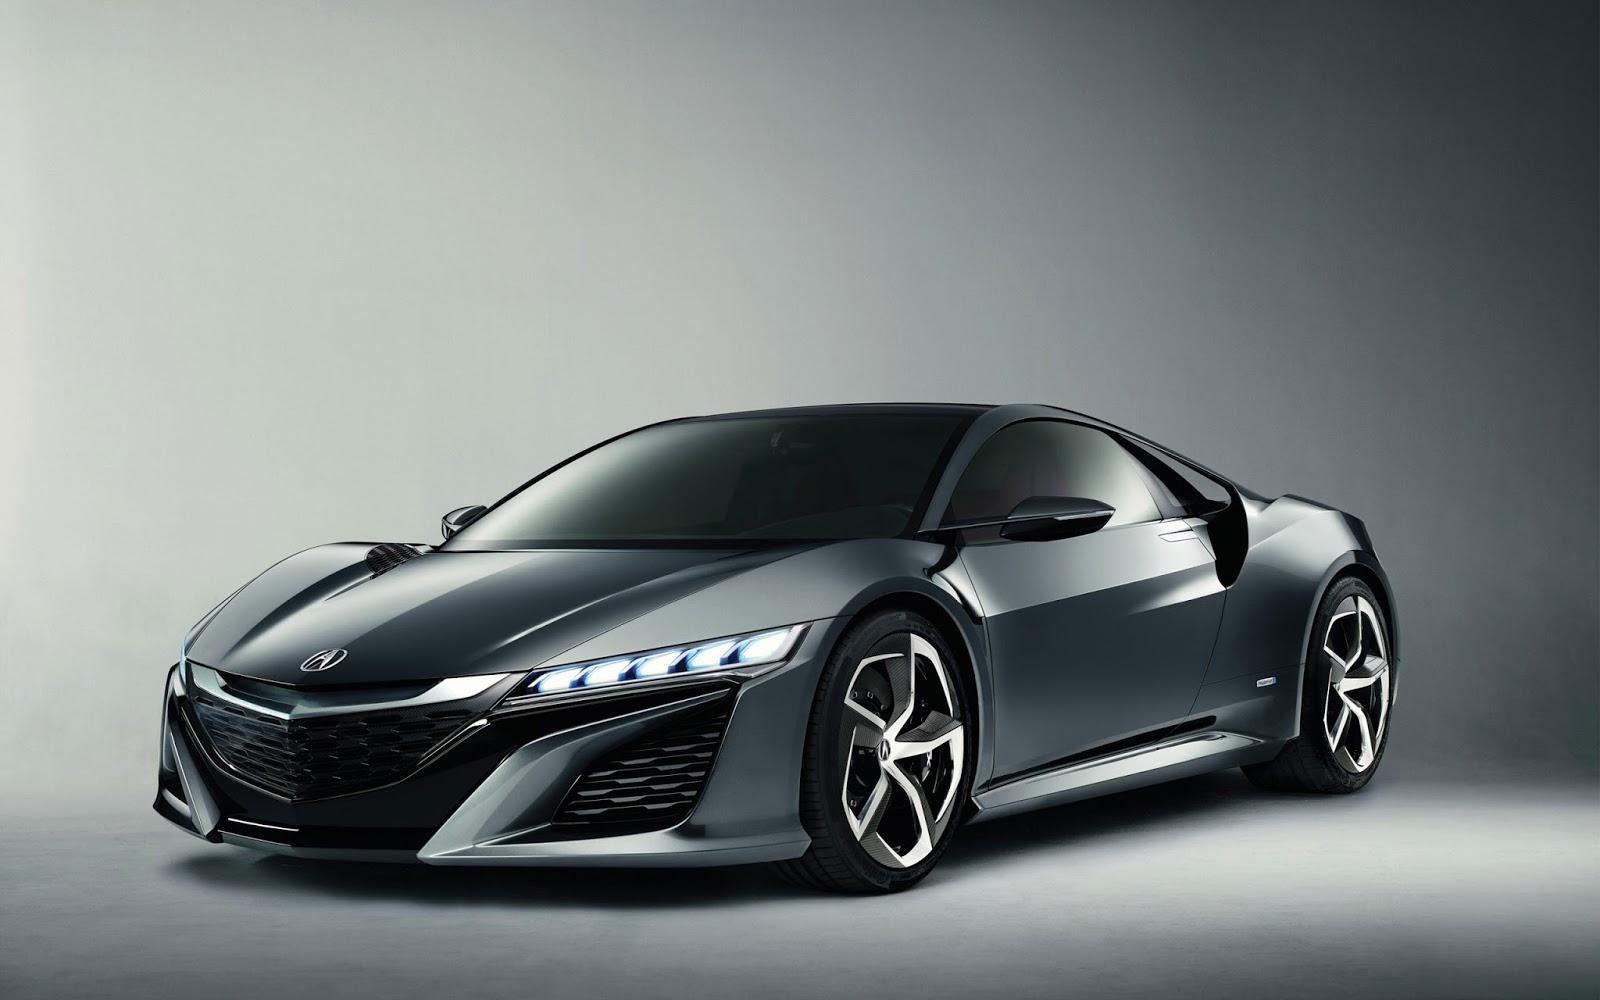 2013 Acura NSX Concept Car